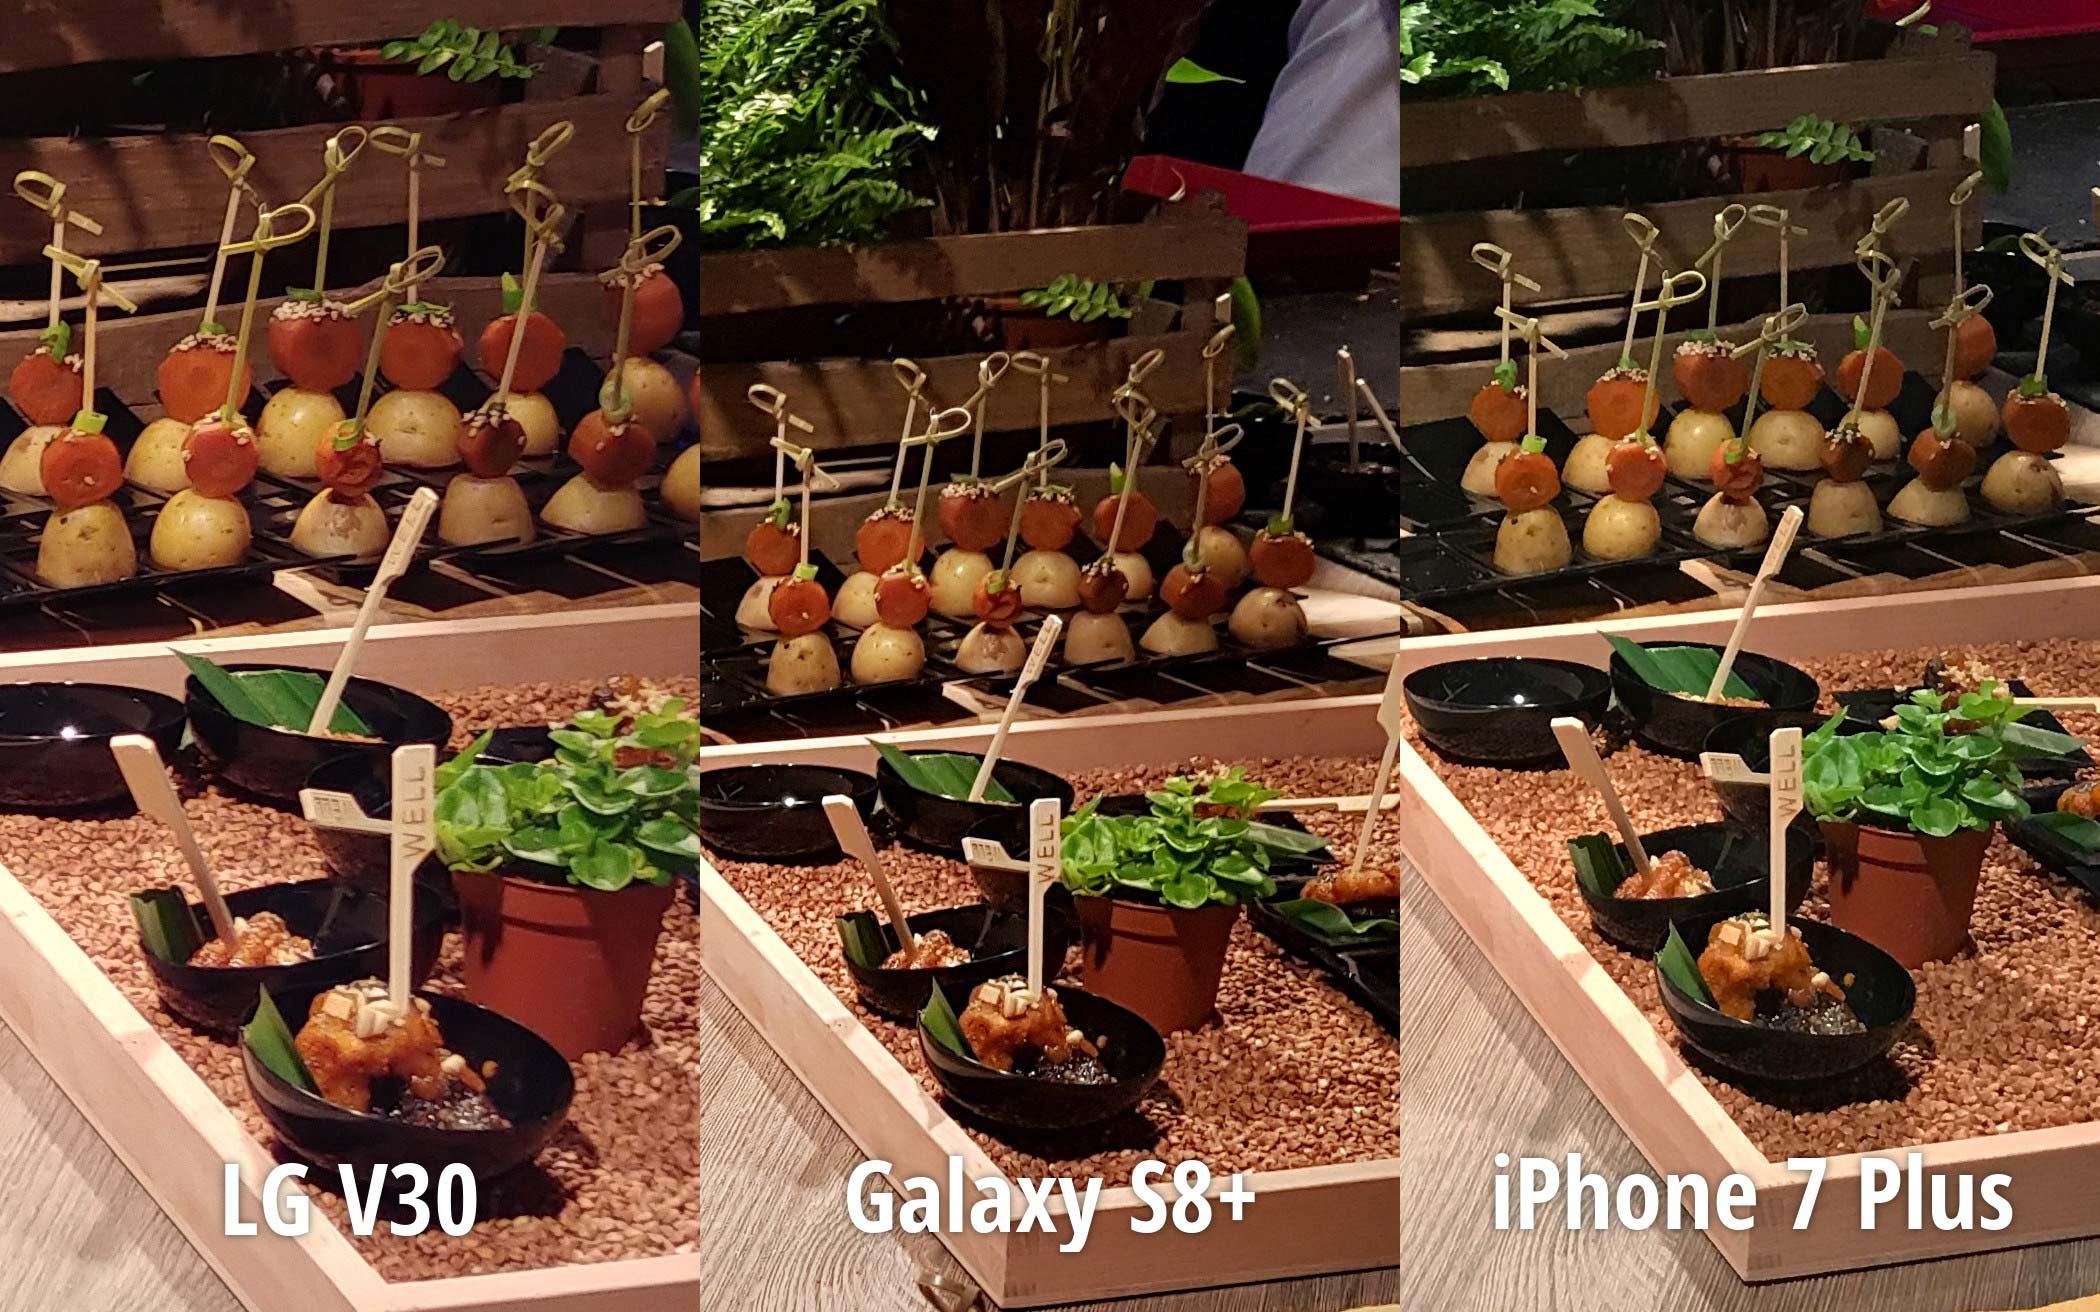 LG-V30-vs-Galaxy-S8-vs-iPhone-7-Plus-camera-photo-samples-(4).jpg